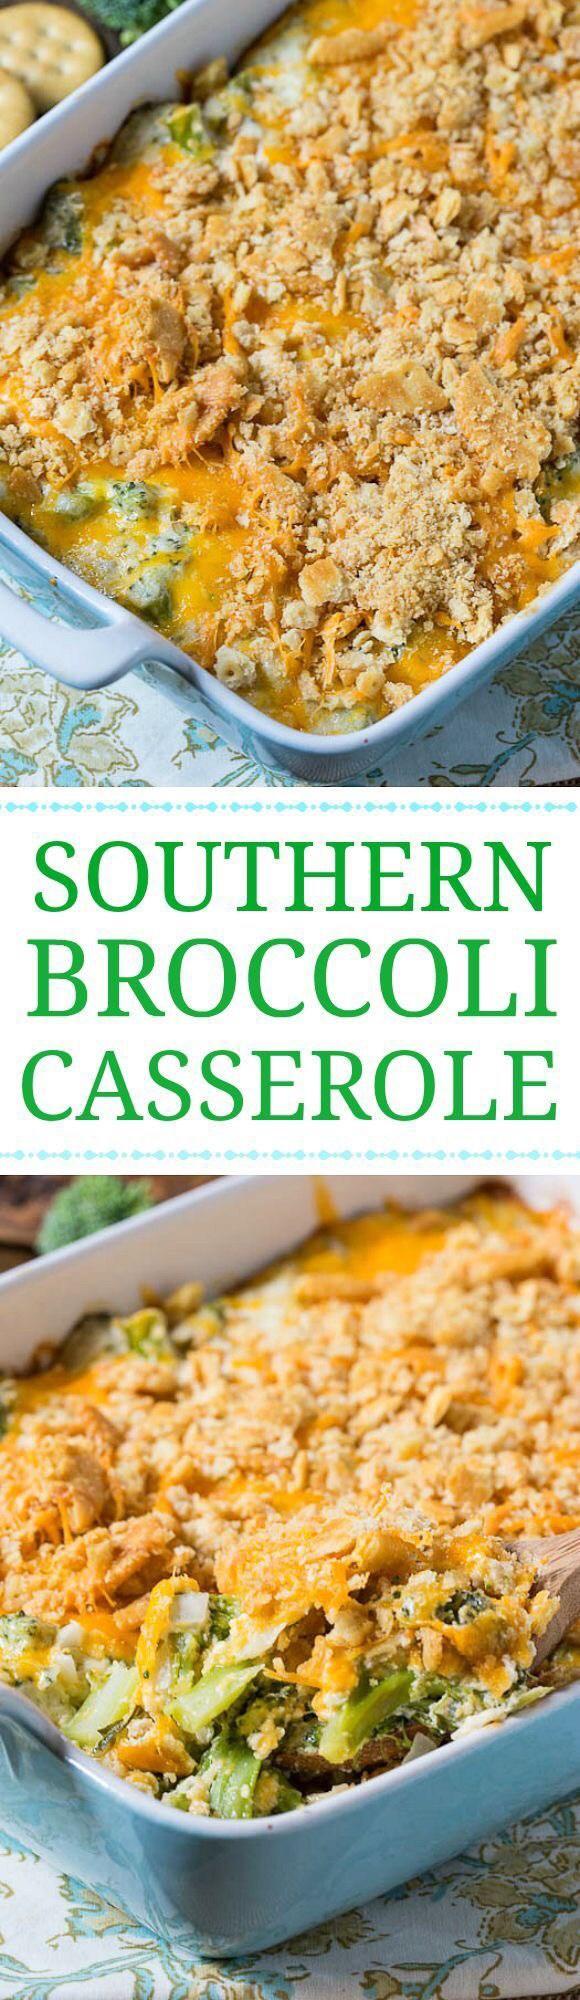 Southern Broccoli Casserole.jpg